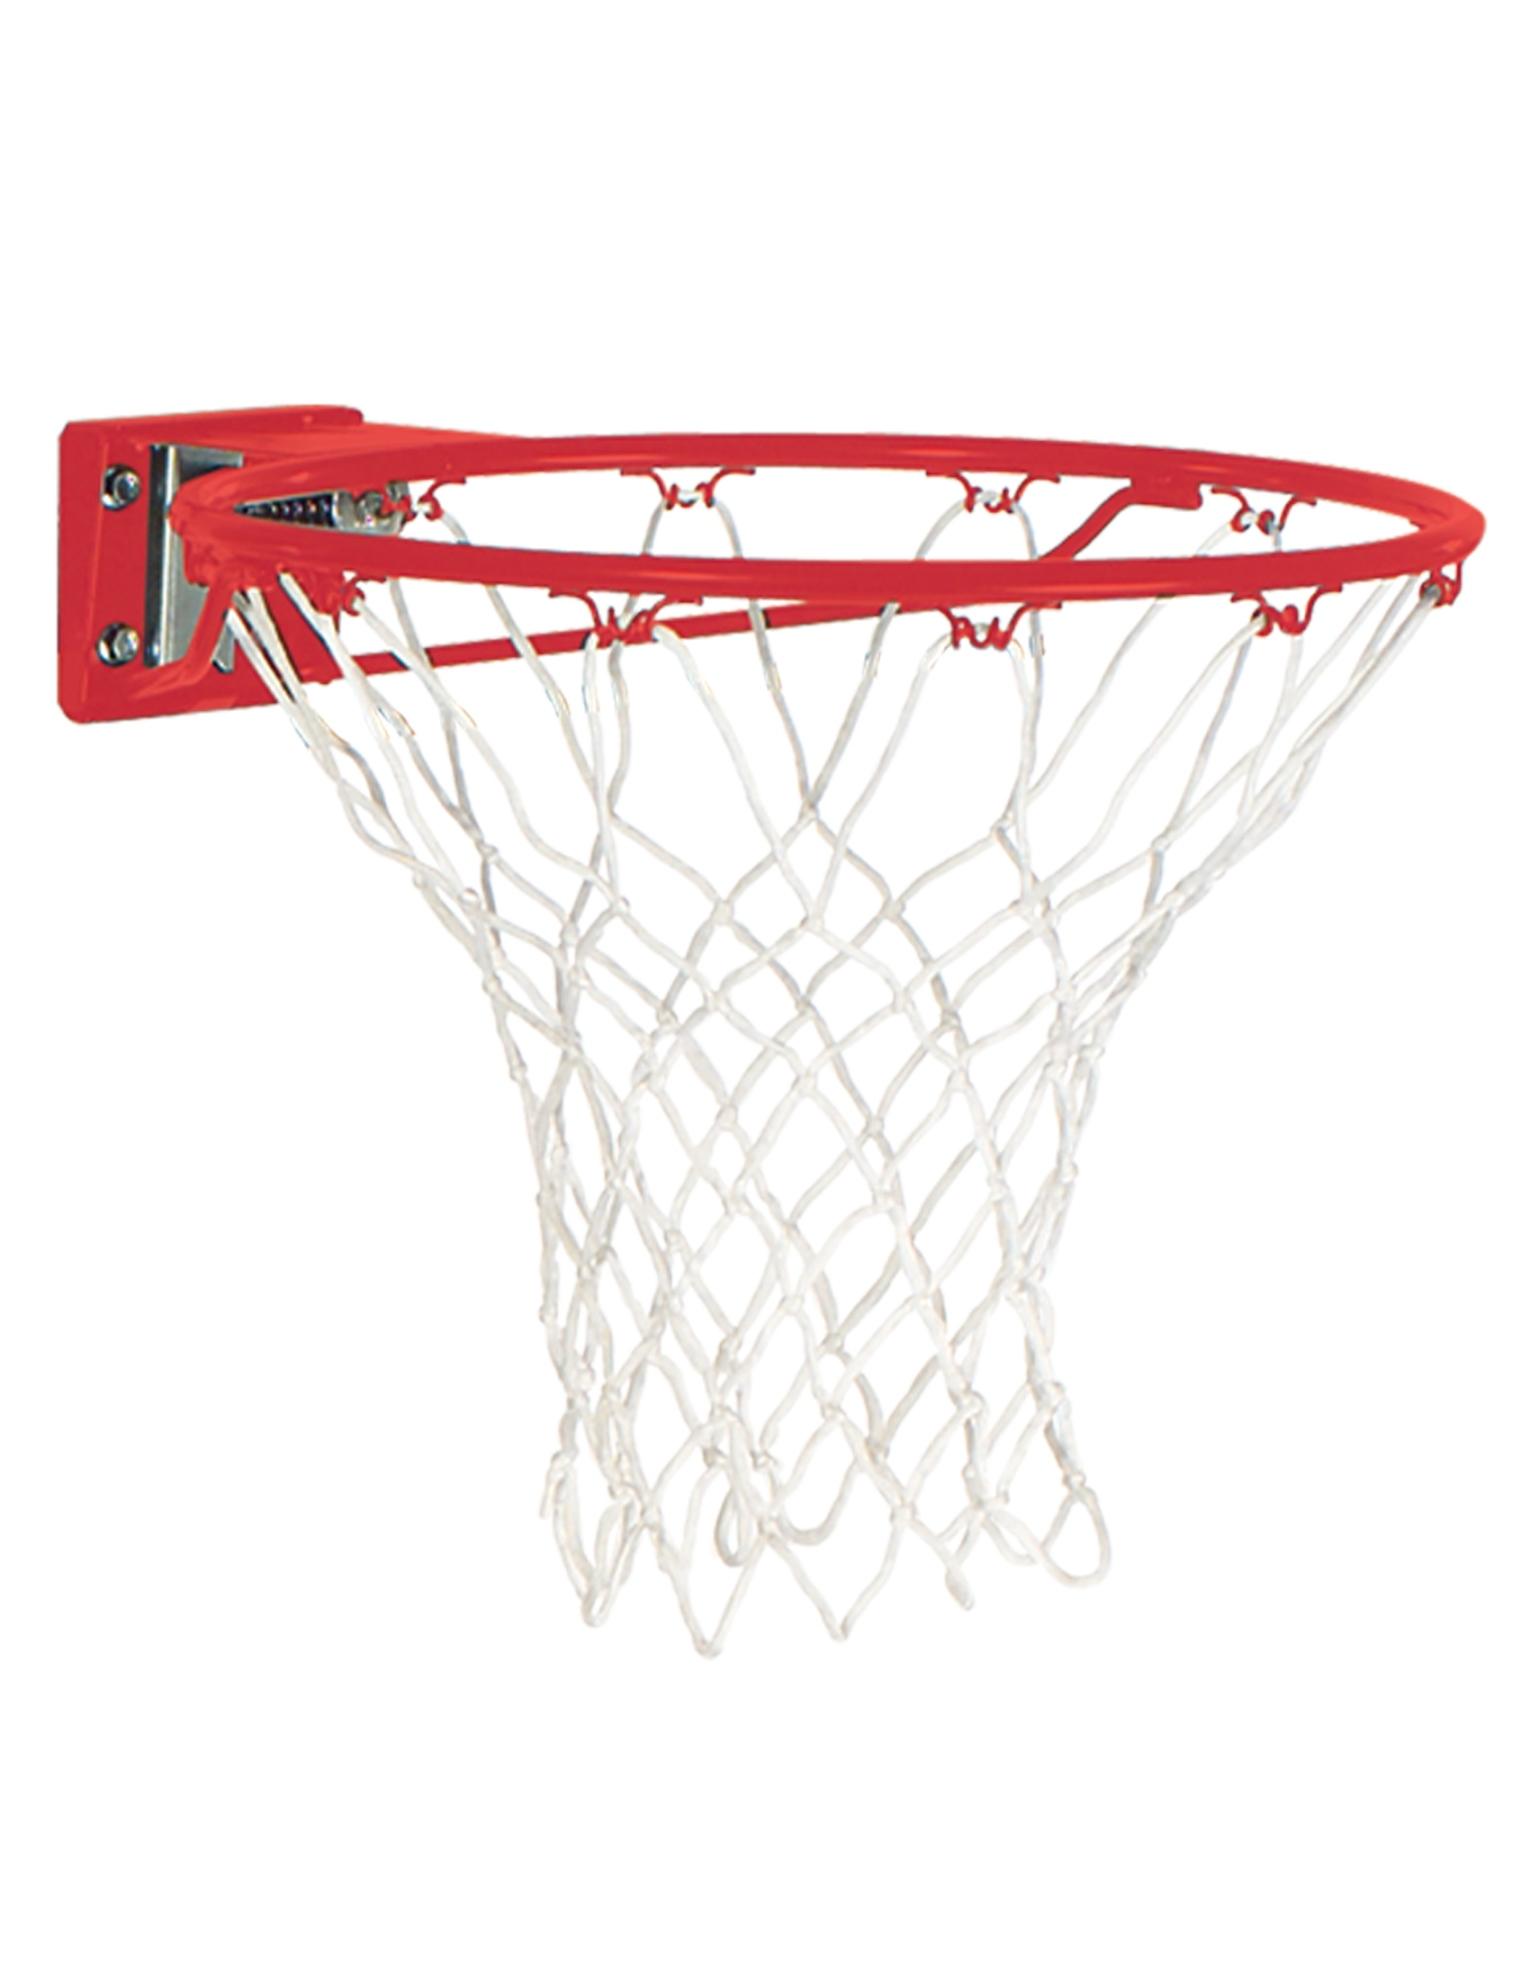 Huffy Spalding Basketball Accessory 7800s Slam Jam Red